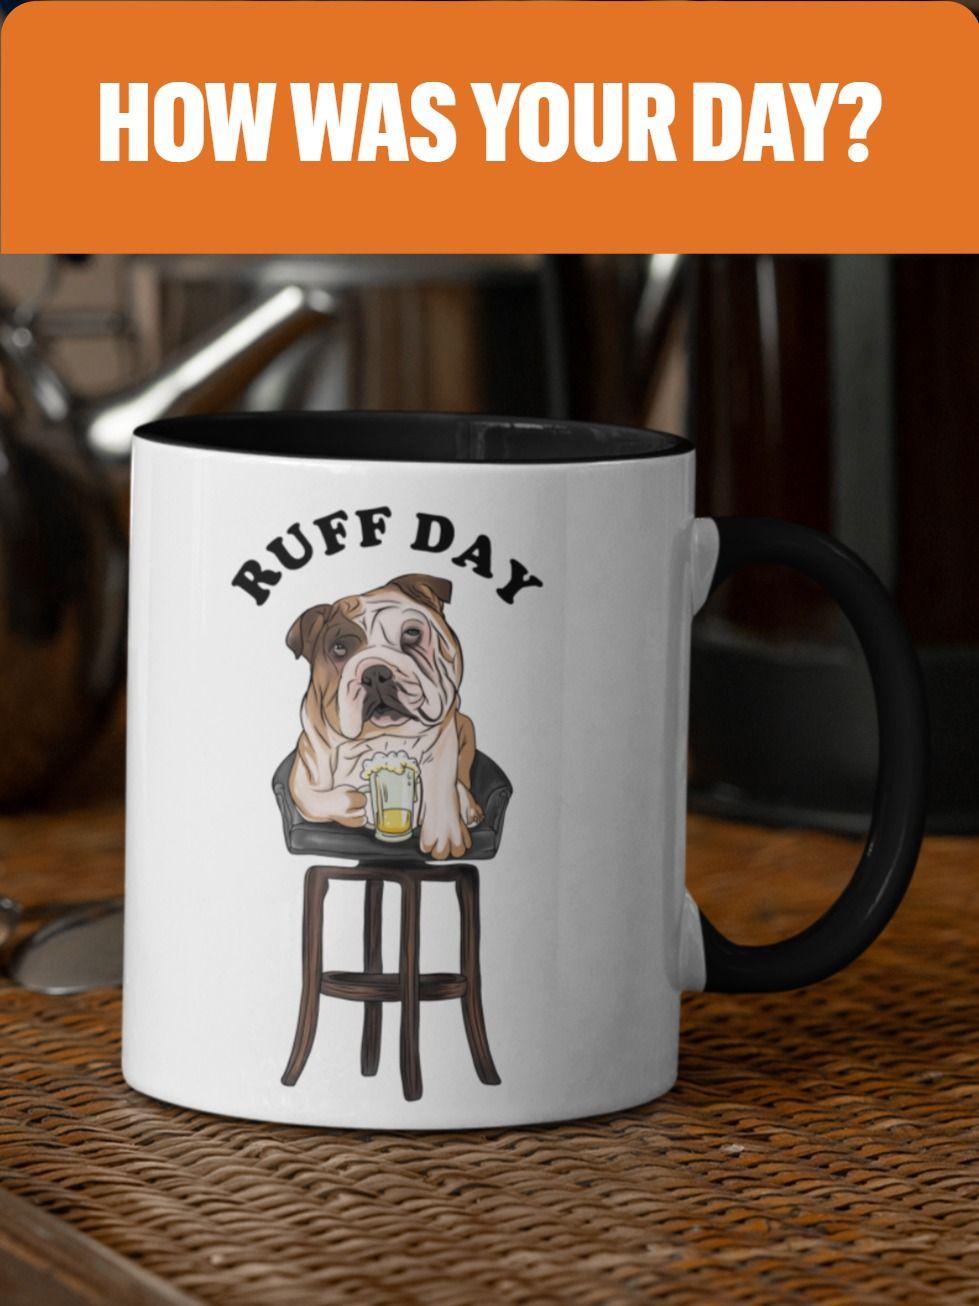 Drinking Bulldog Ruff Day Funny Coffee Mugs Etsy Mugs Funny Coffee Mugs Funny Animal Jokes